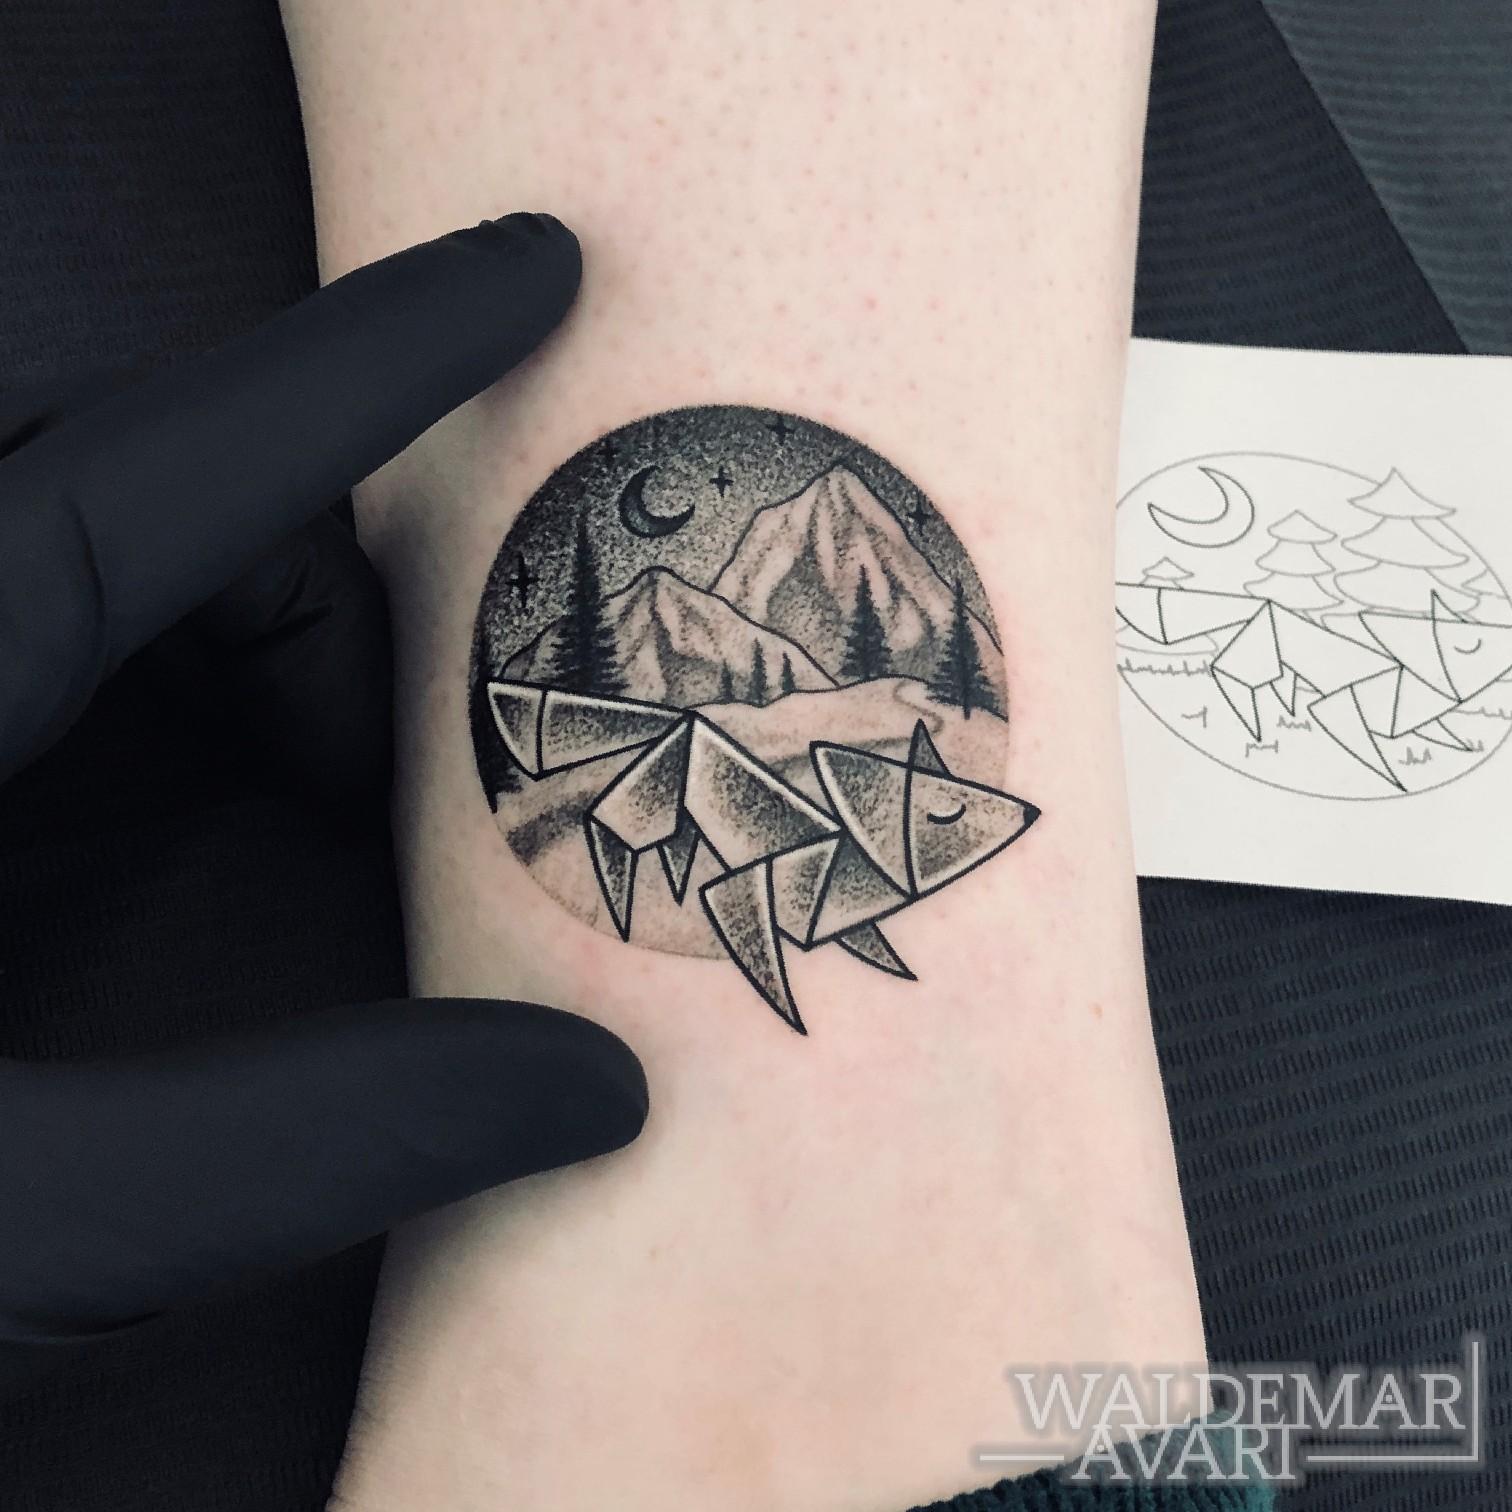 WALDEMAR AVARI - Full Colour Tattoo Bochum